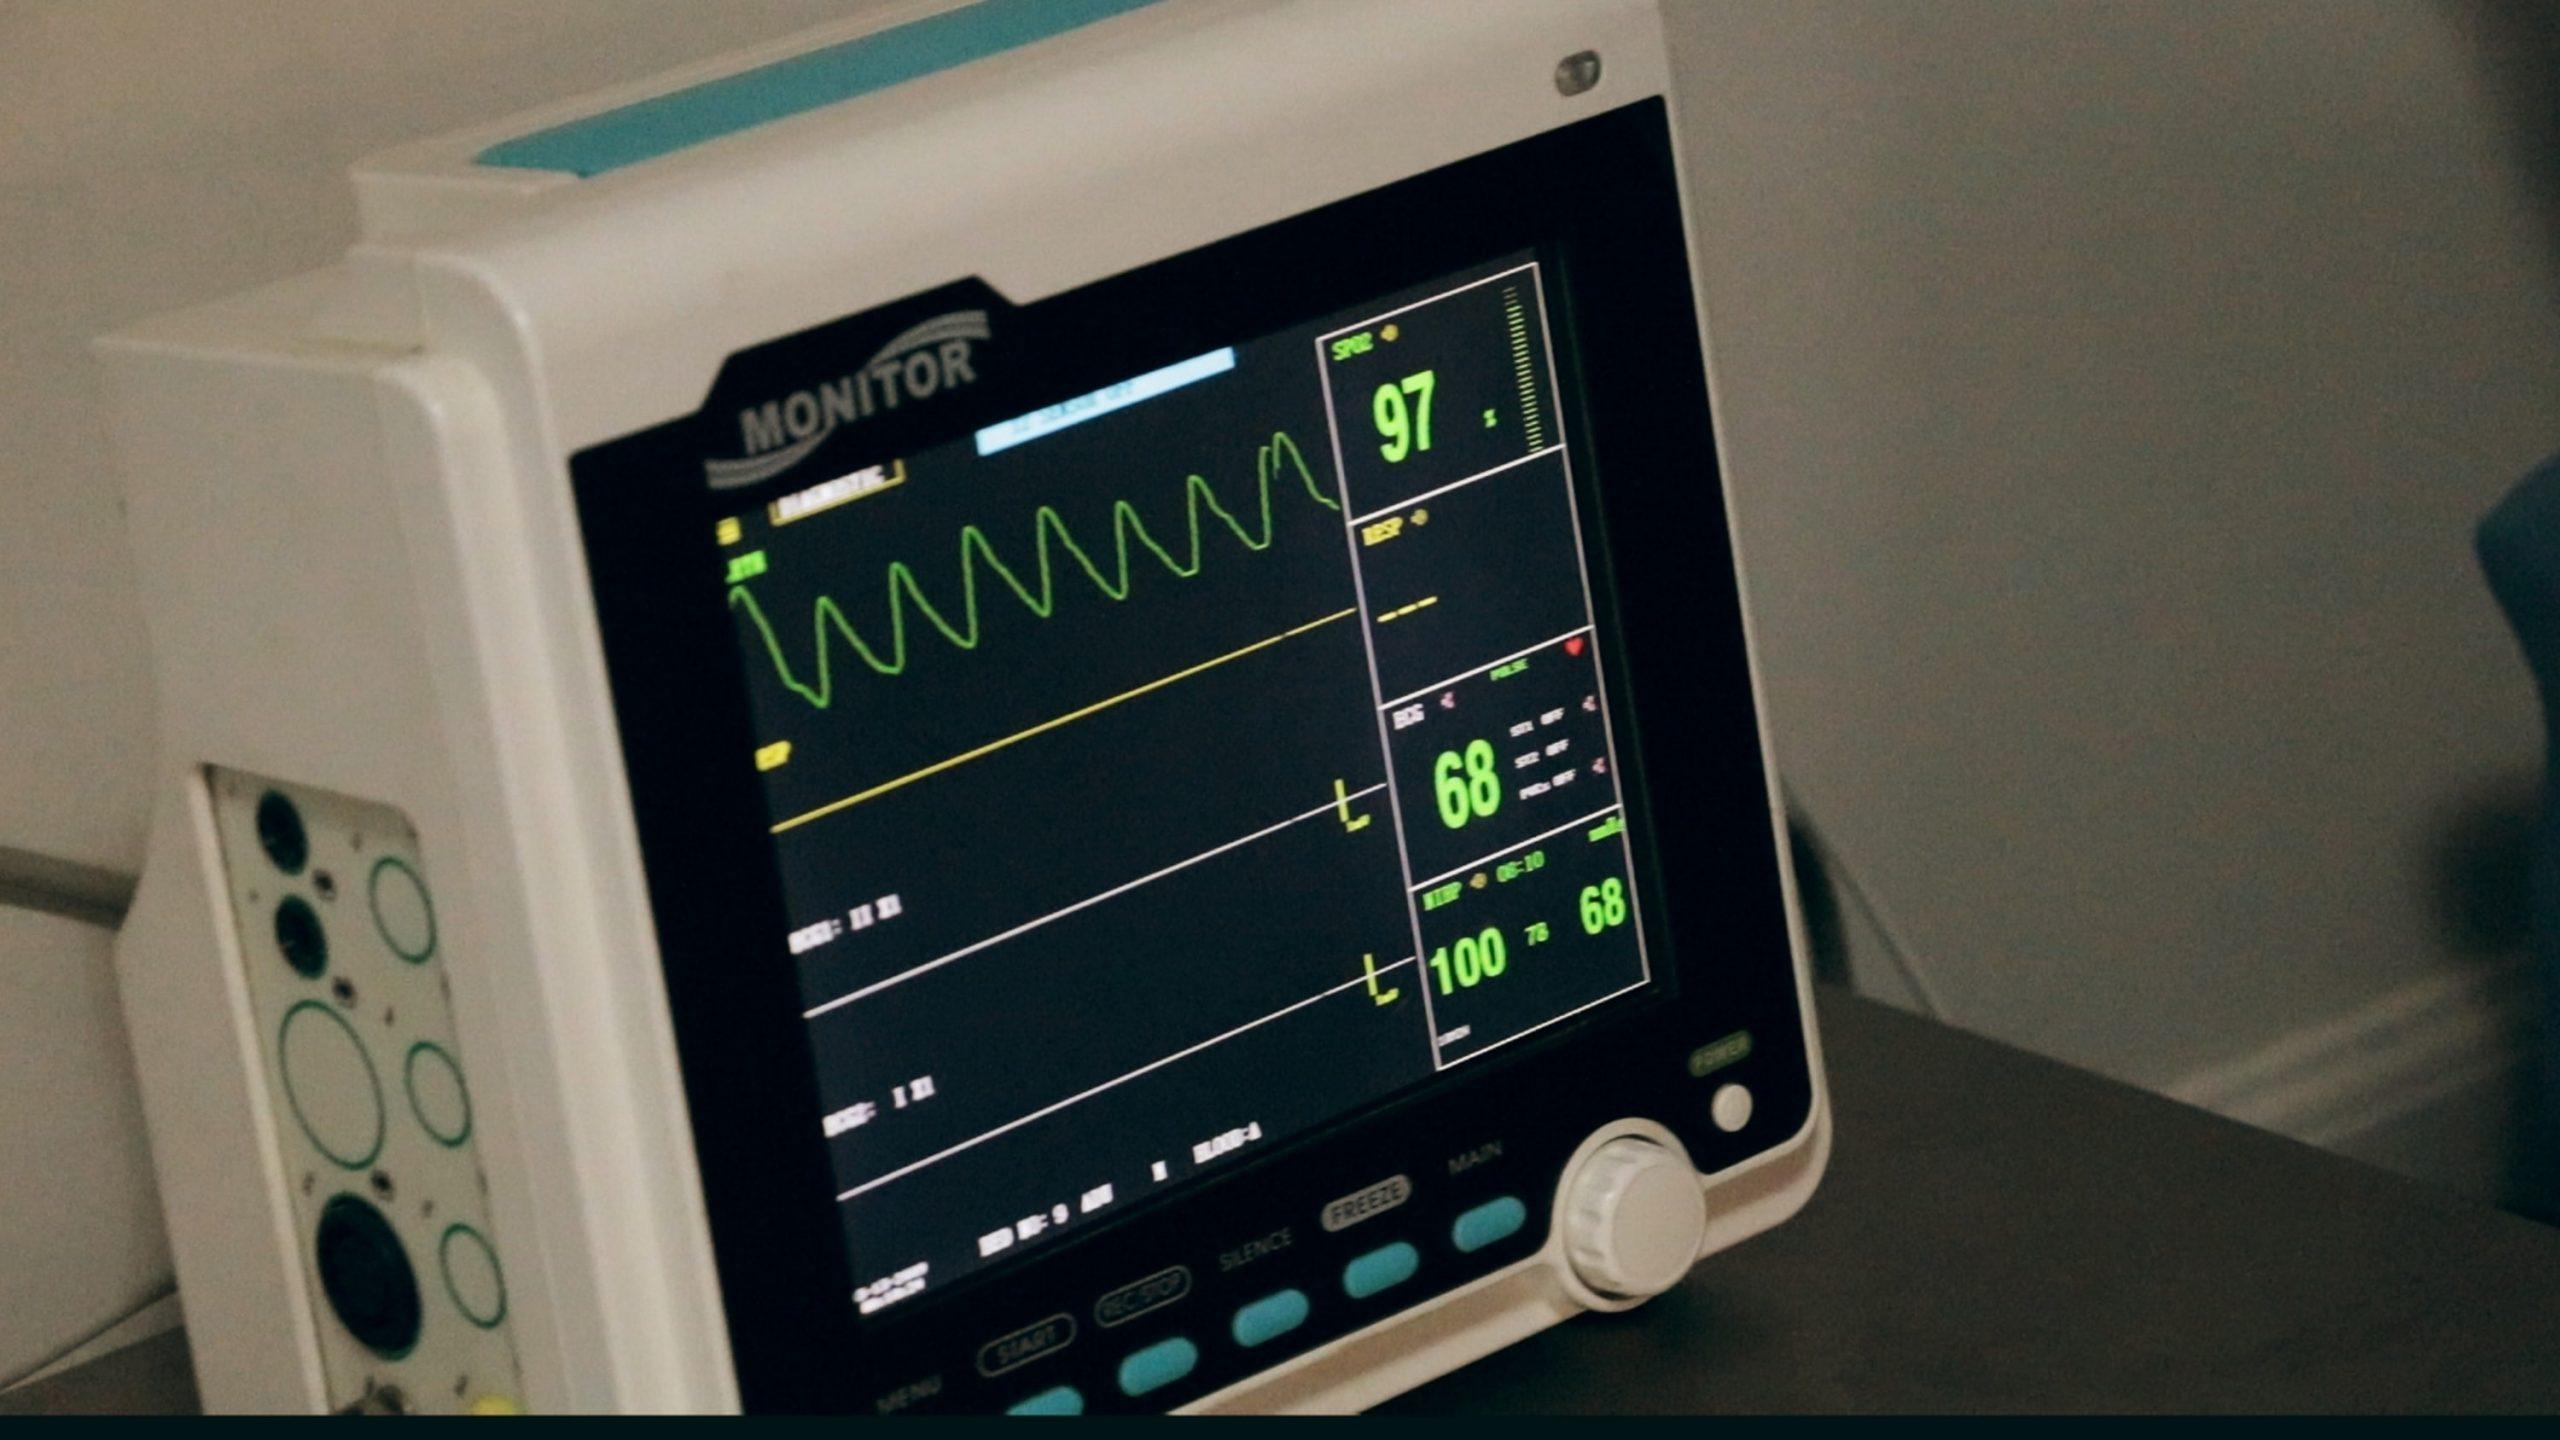 A hospital monitor.